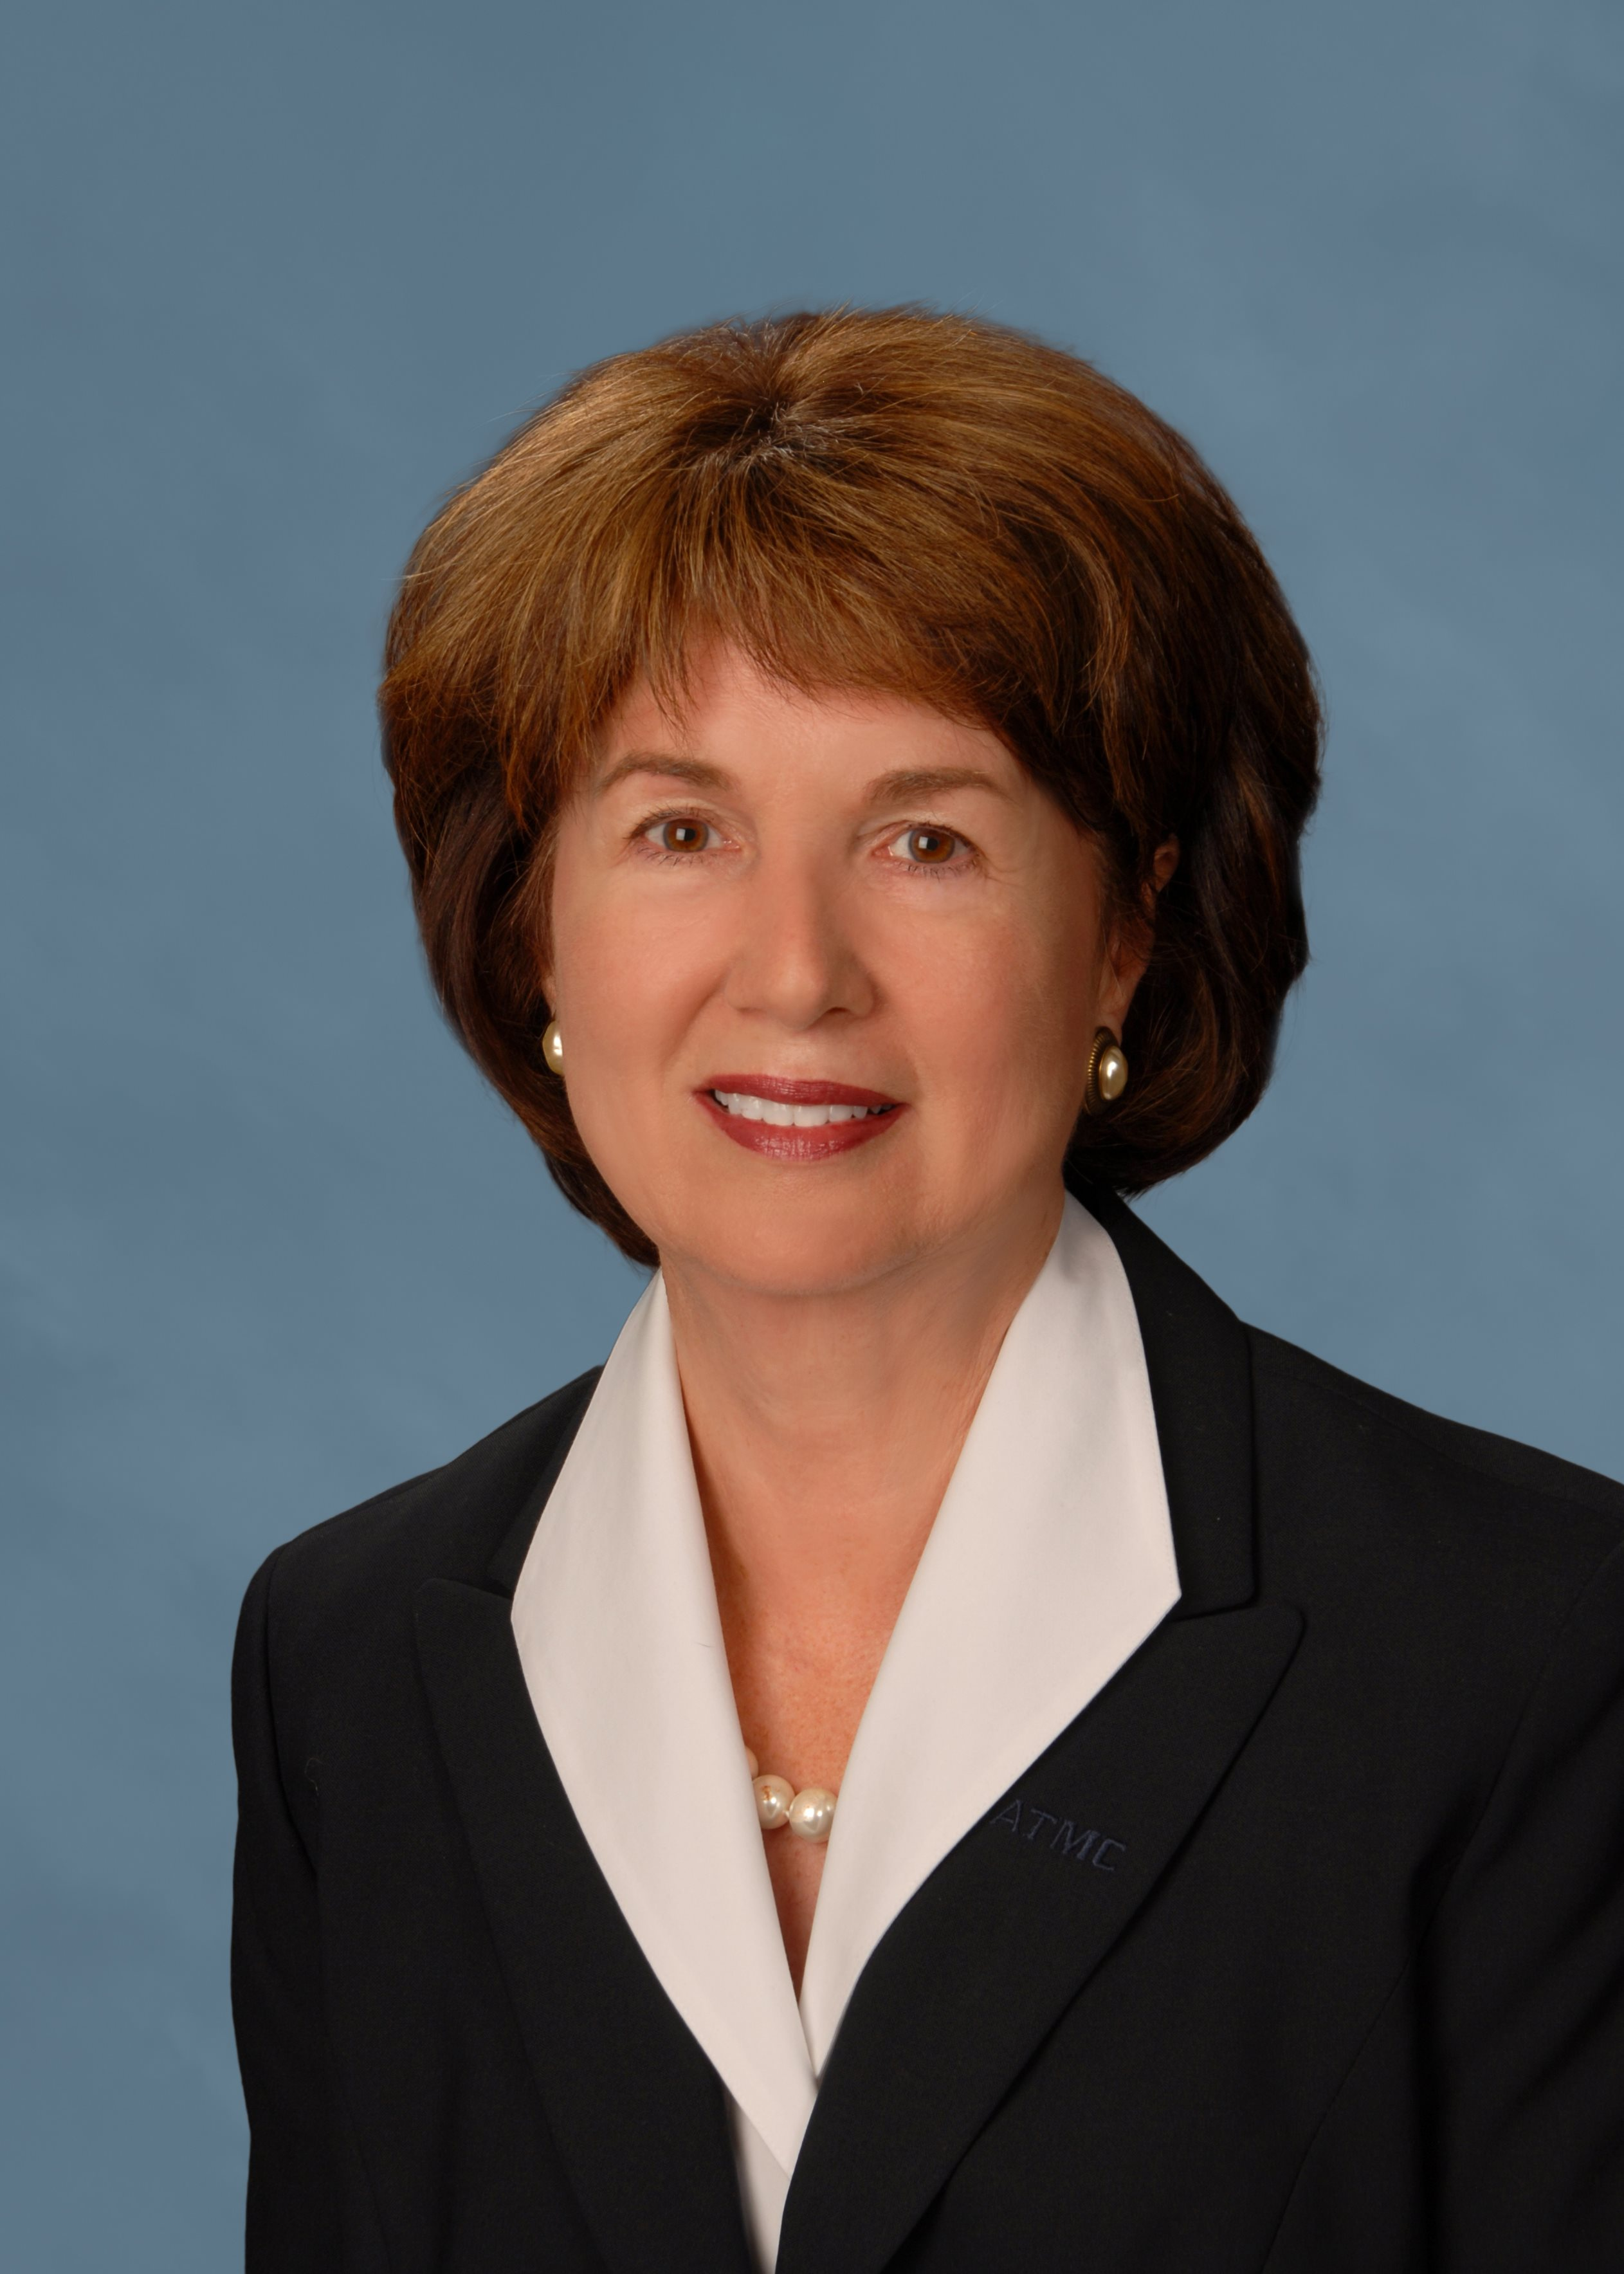 ATMC Secretary/Treasurer | Janice Gore